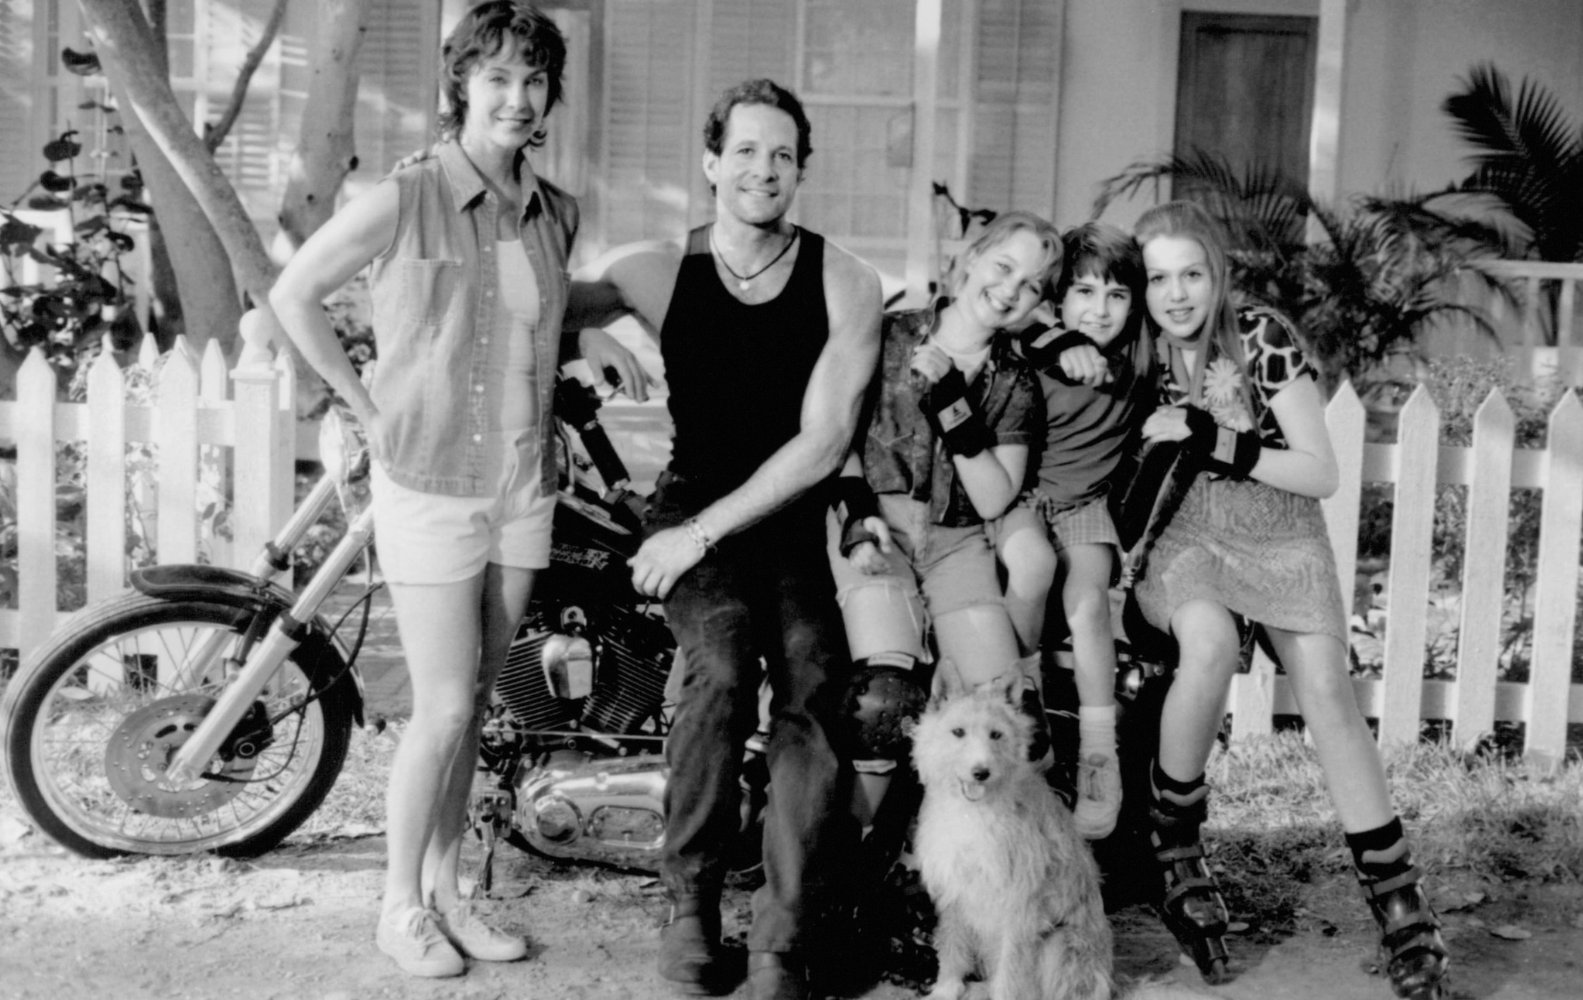 Nicole Fosse,Rhonda Fleming Sex clip Mikie Hara (b. 1987),Isabella Rossellini